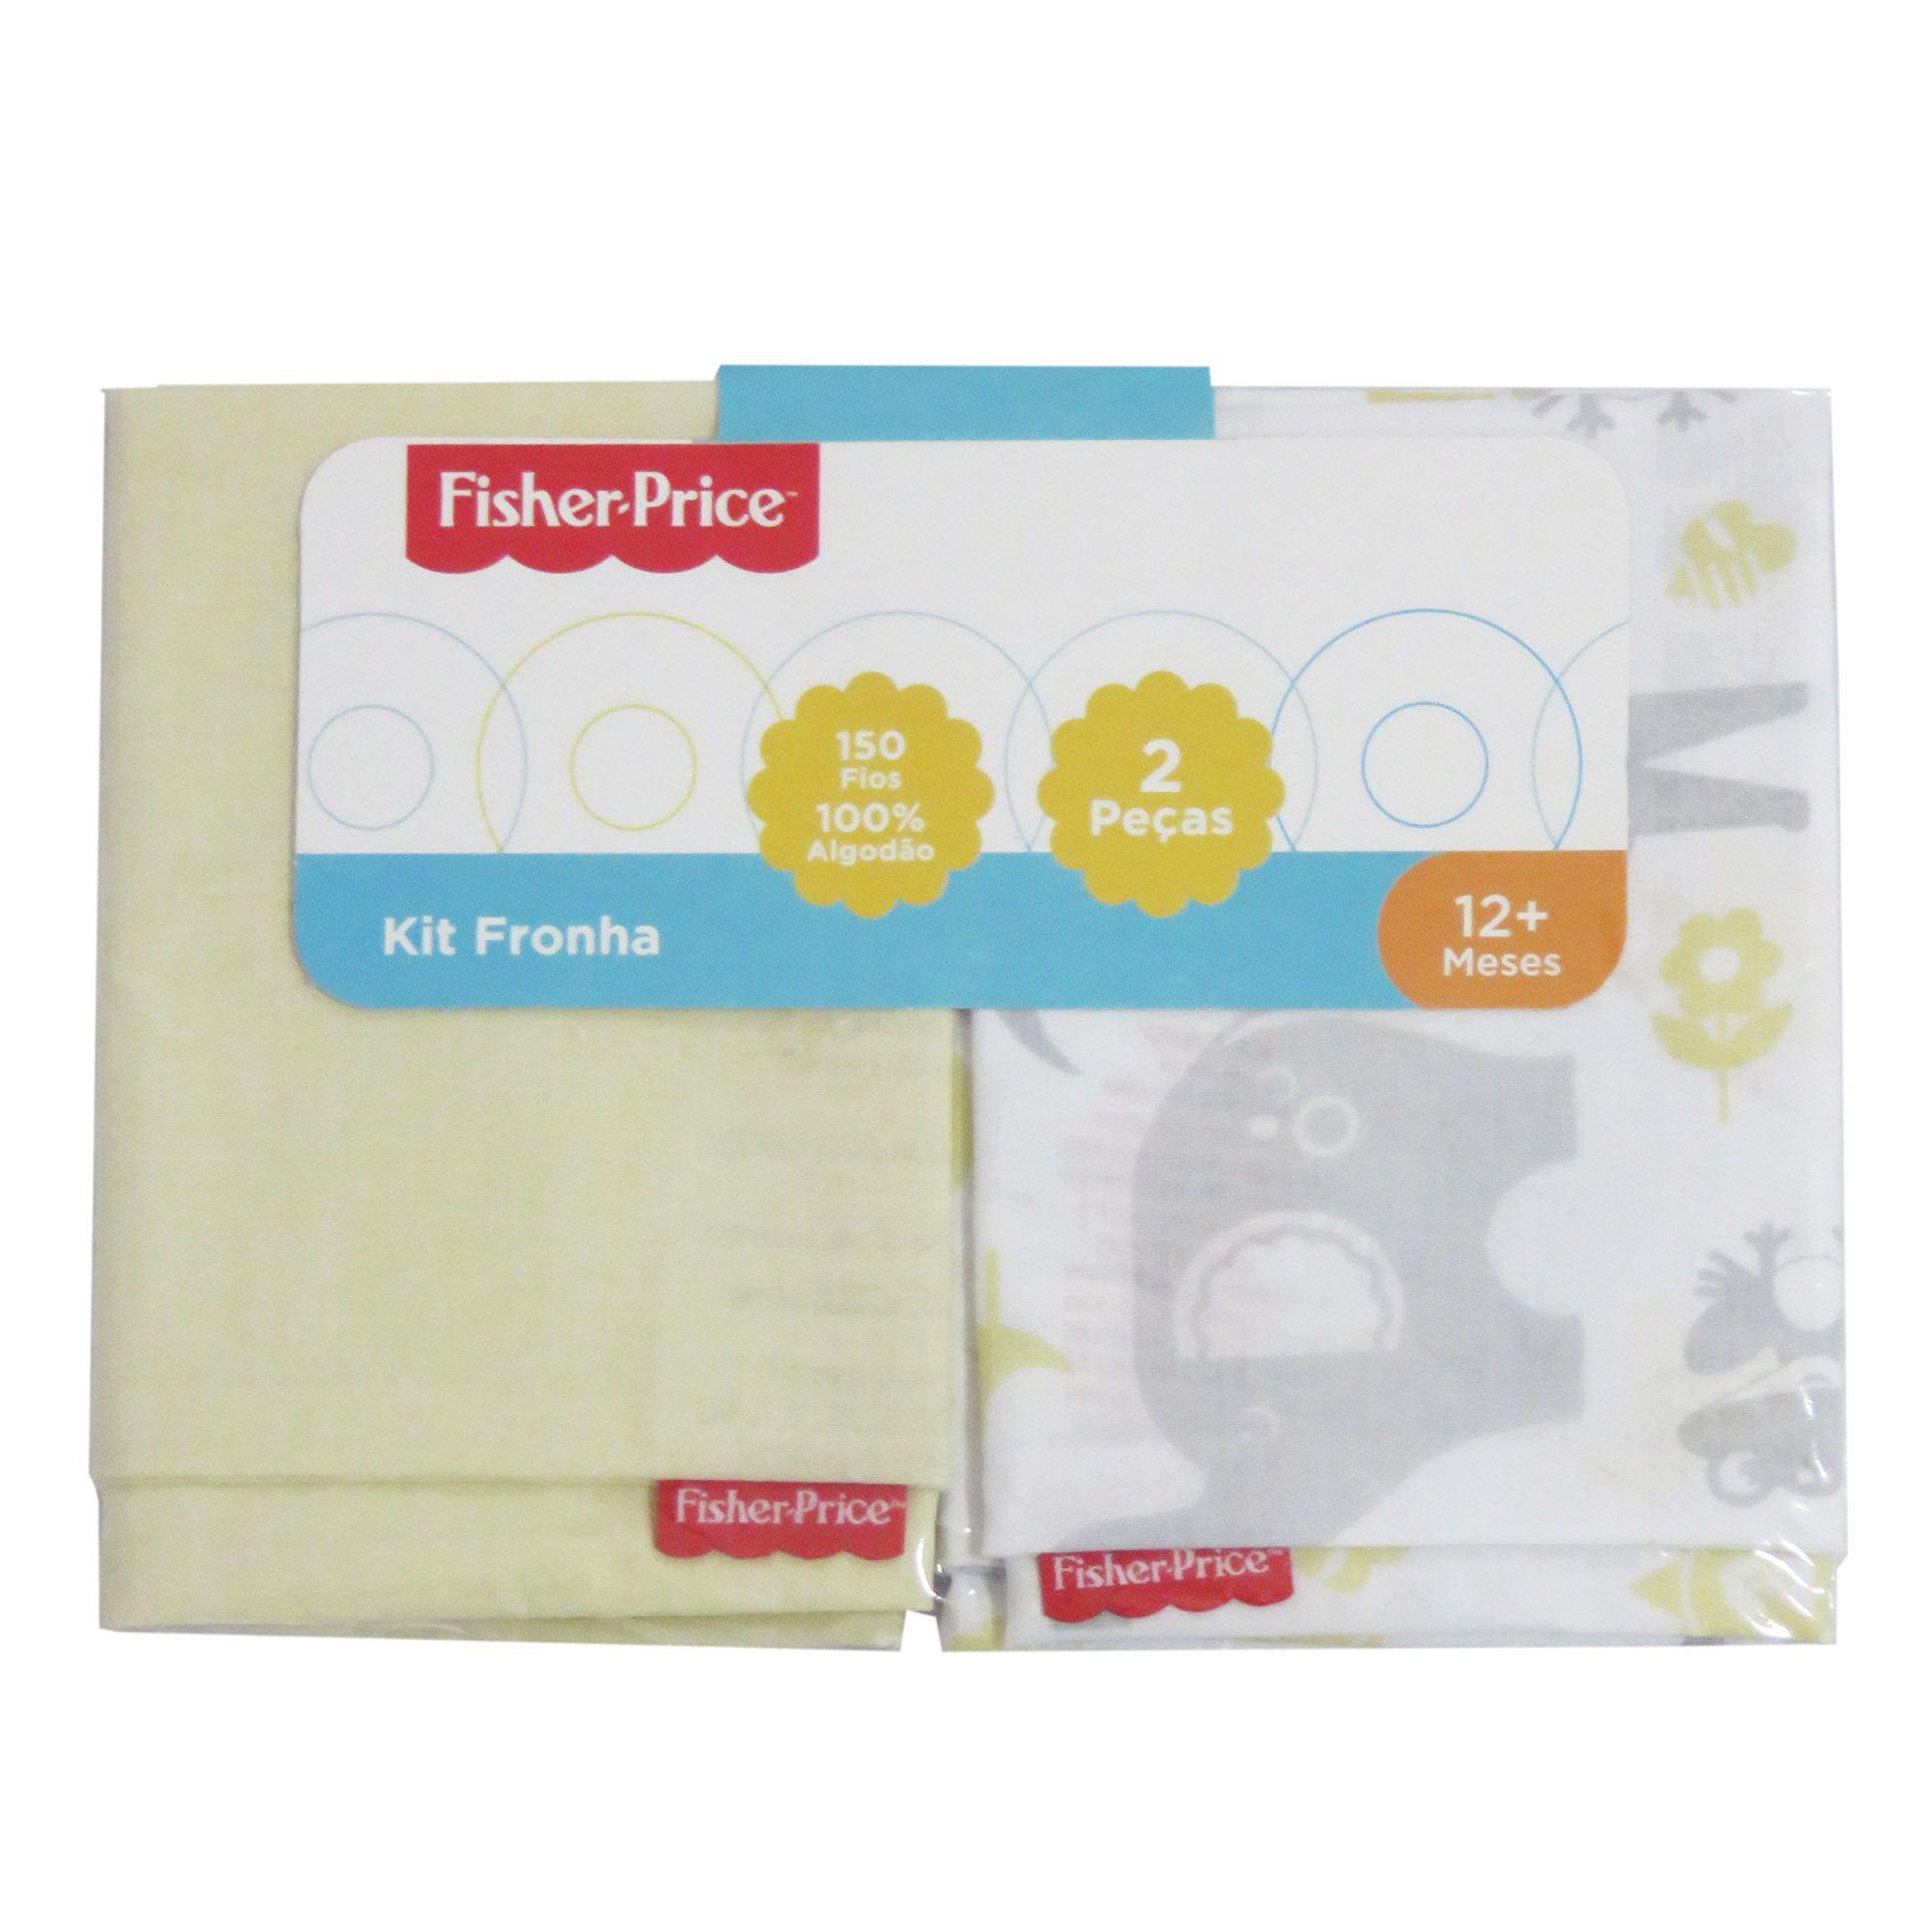 Kit Fronha Incomfral Fisher-Price - Amarelo Claro